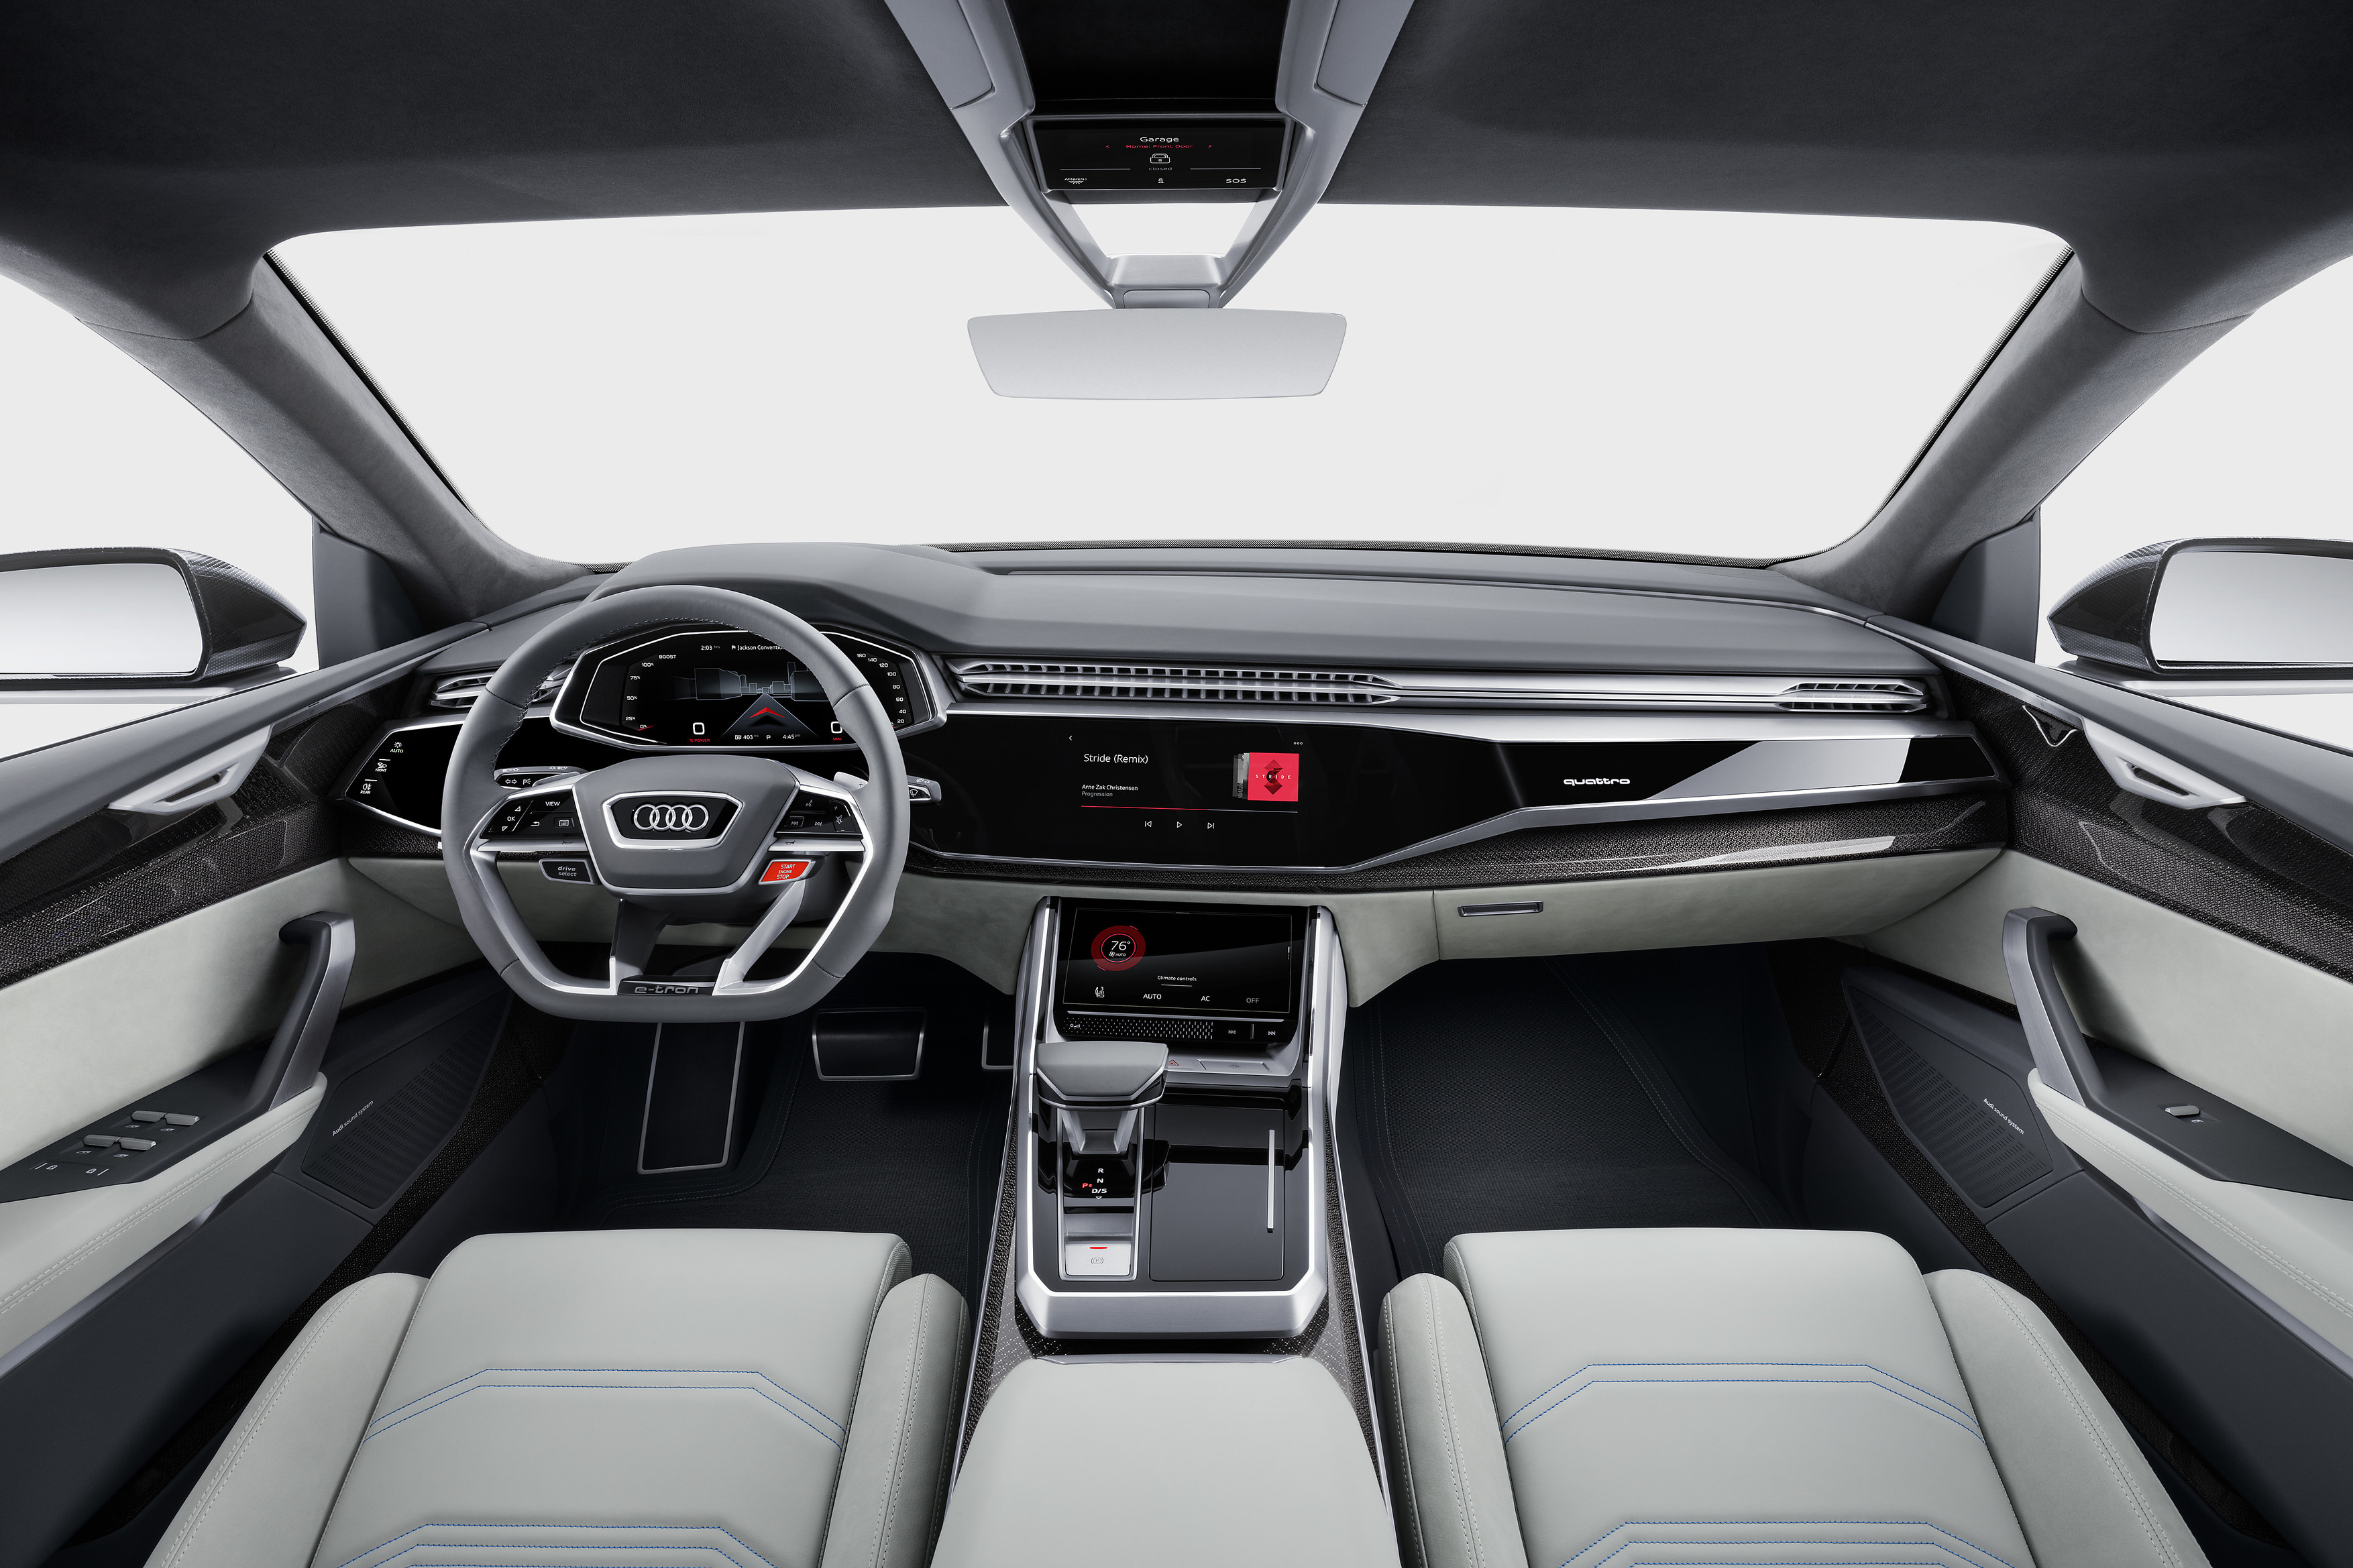 Audi Q8 concept autonieuws van 9 januari 2017